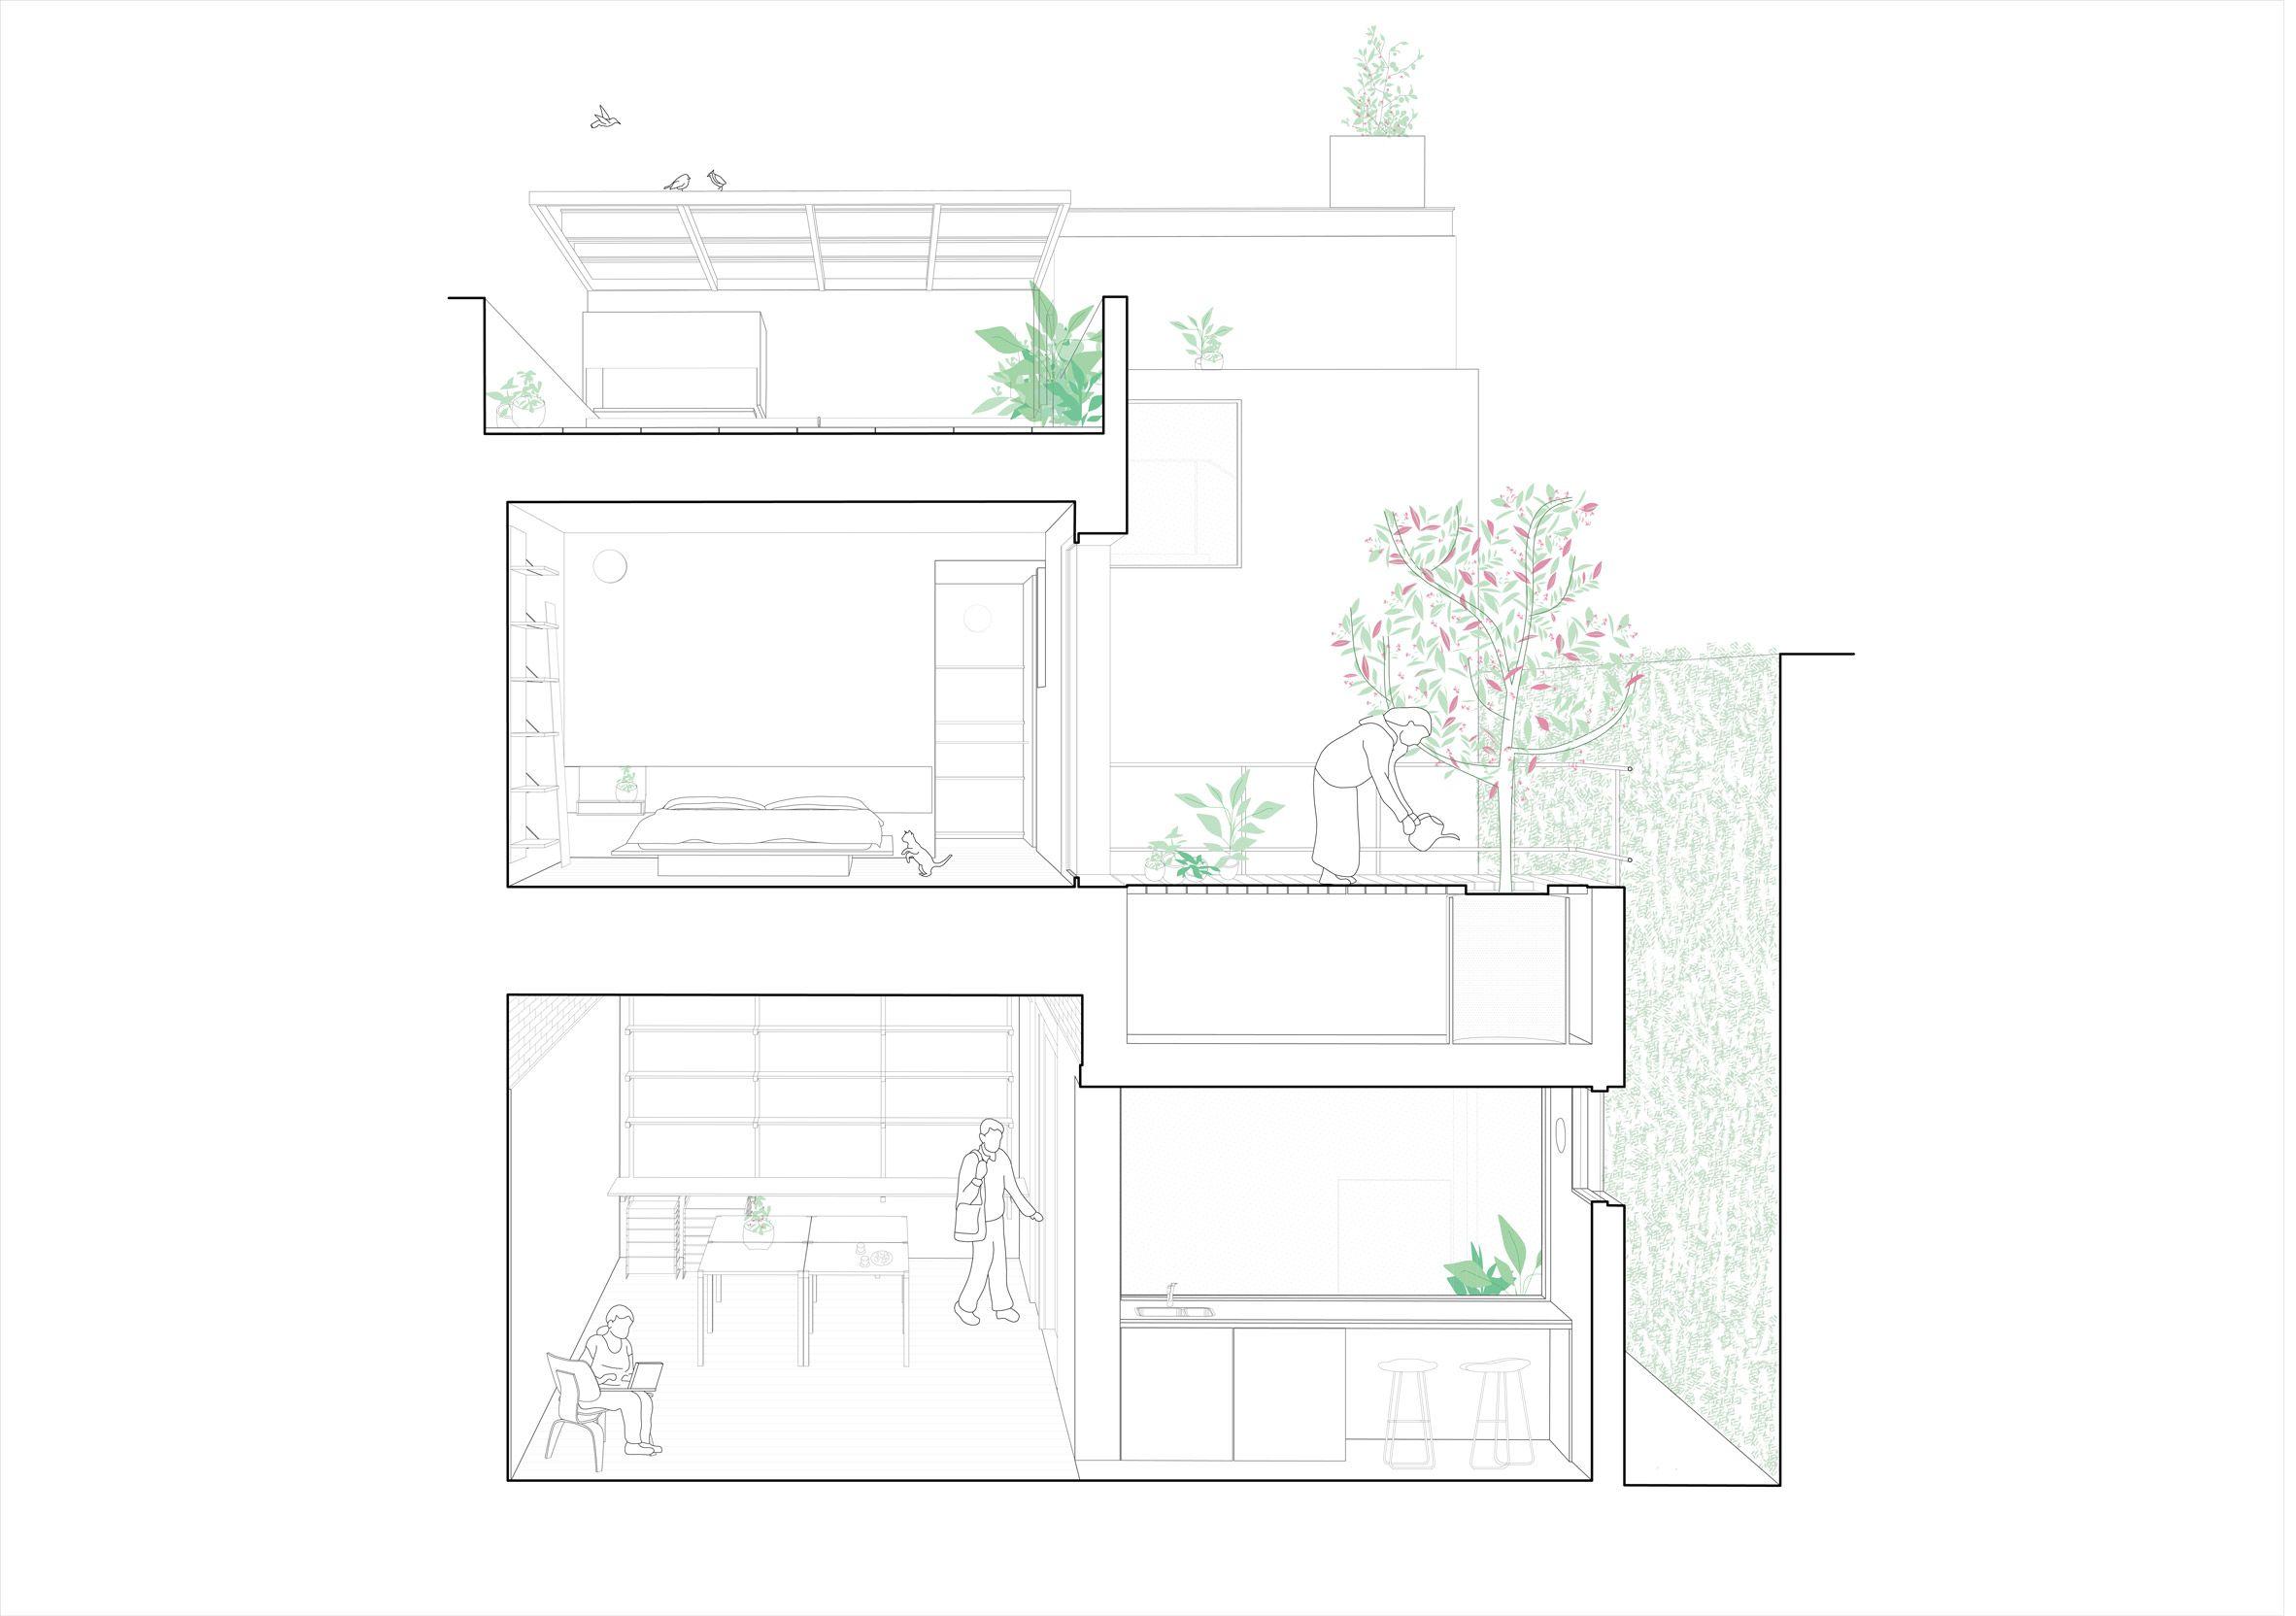 Alonso Amp Crippa Renovates Compact Urban Dwelling In Buenos